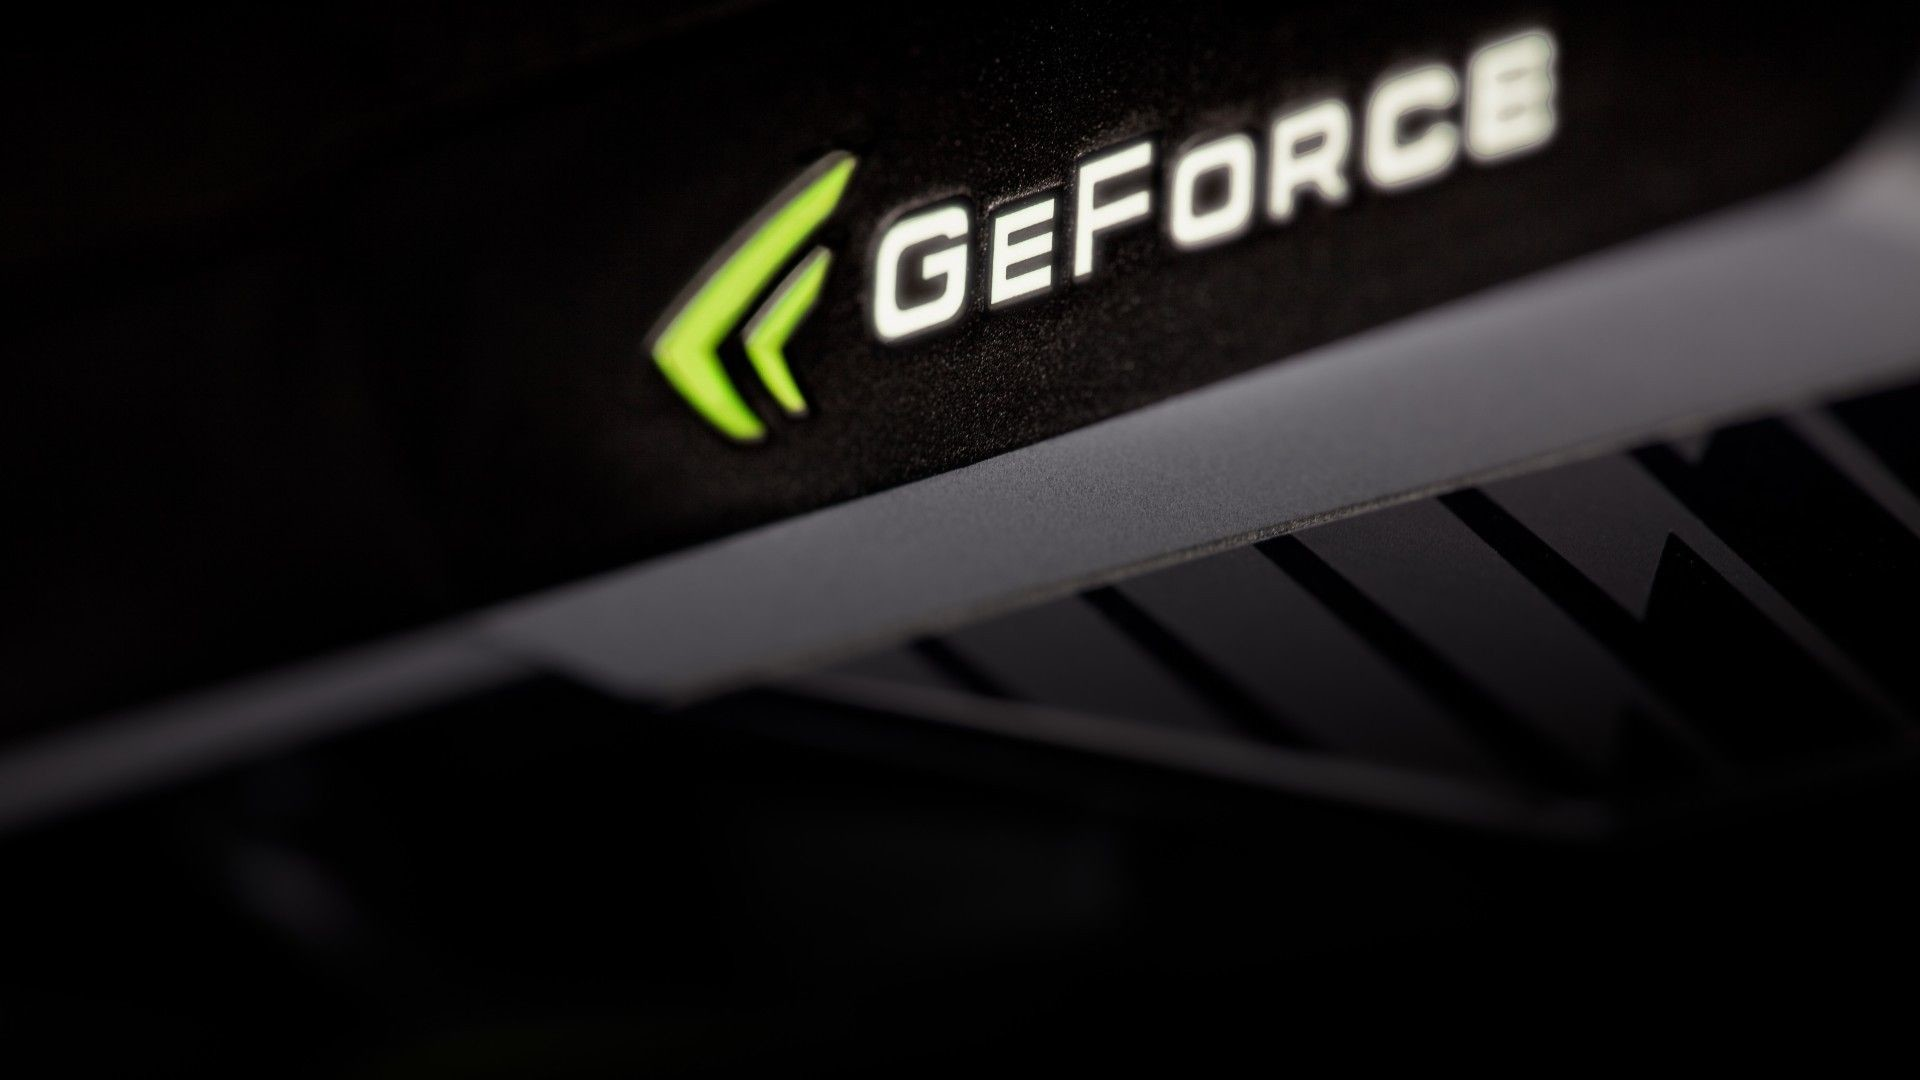 EVGA <b>GeForce GTX</b> TITAN <b>Wallpaper<